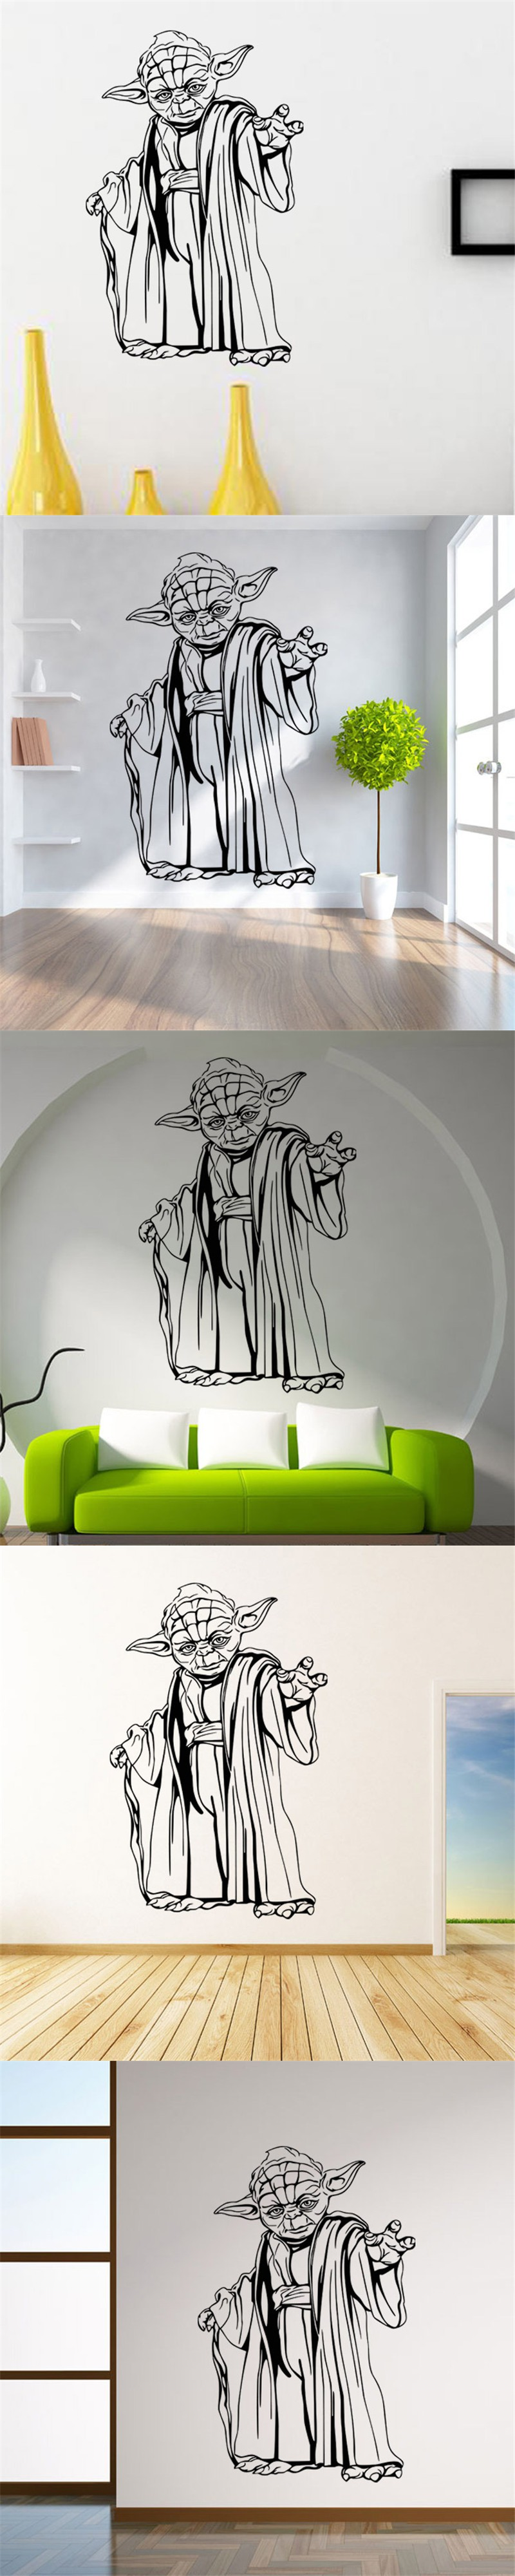 Yoda star wars art wall sticker poster star wars kids bedroom decor